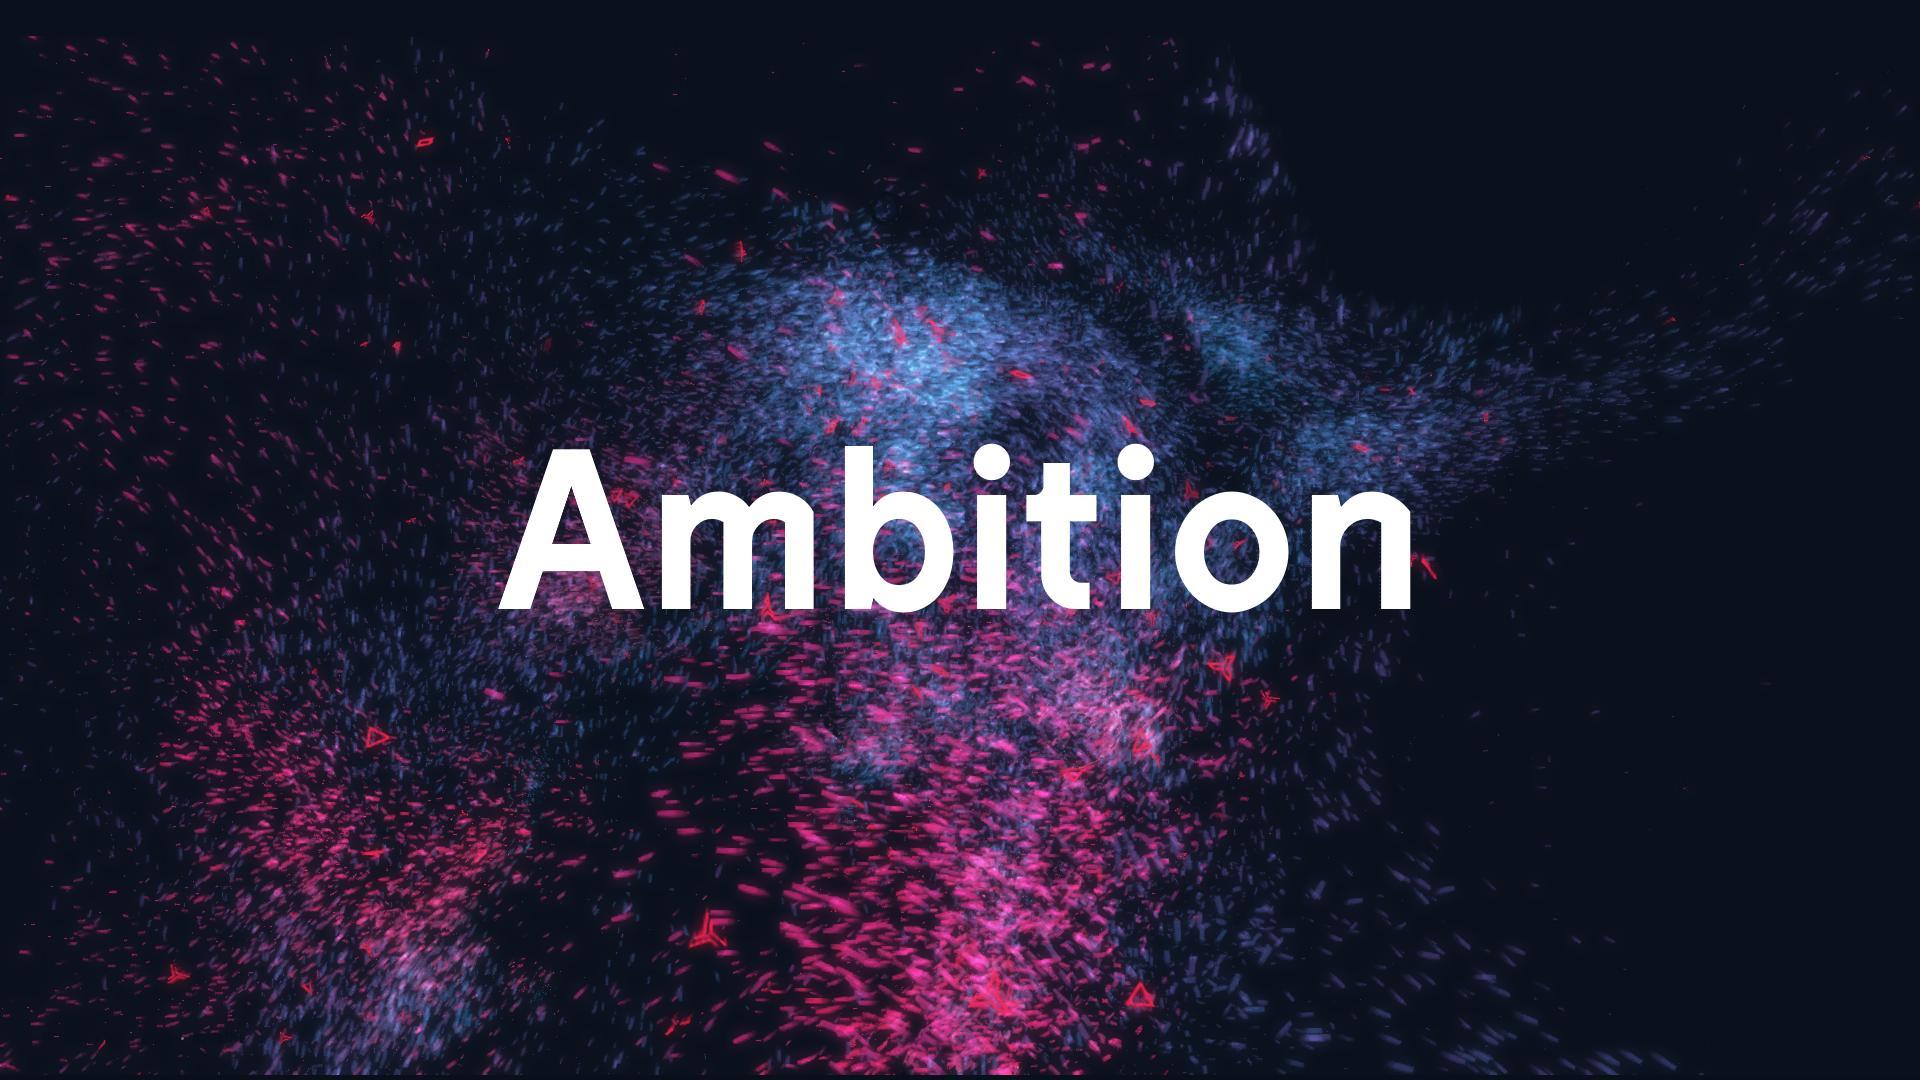 [18+] Ambition Wallpapers on WallpaperSafari